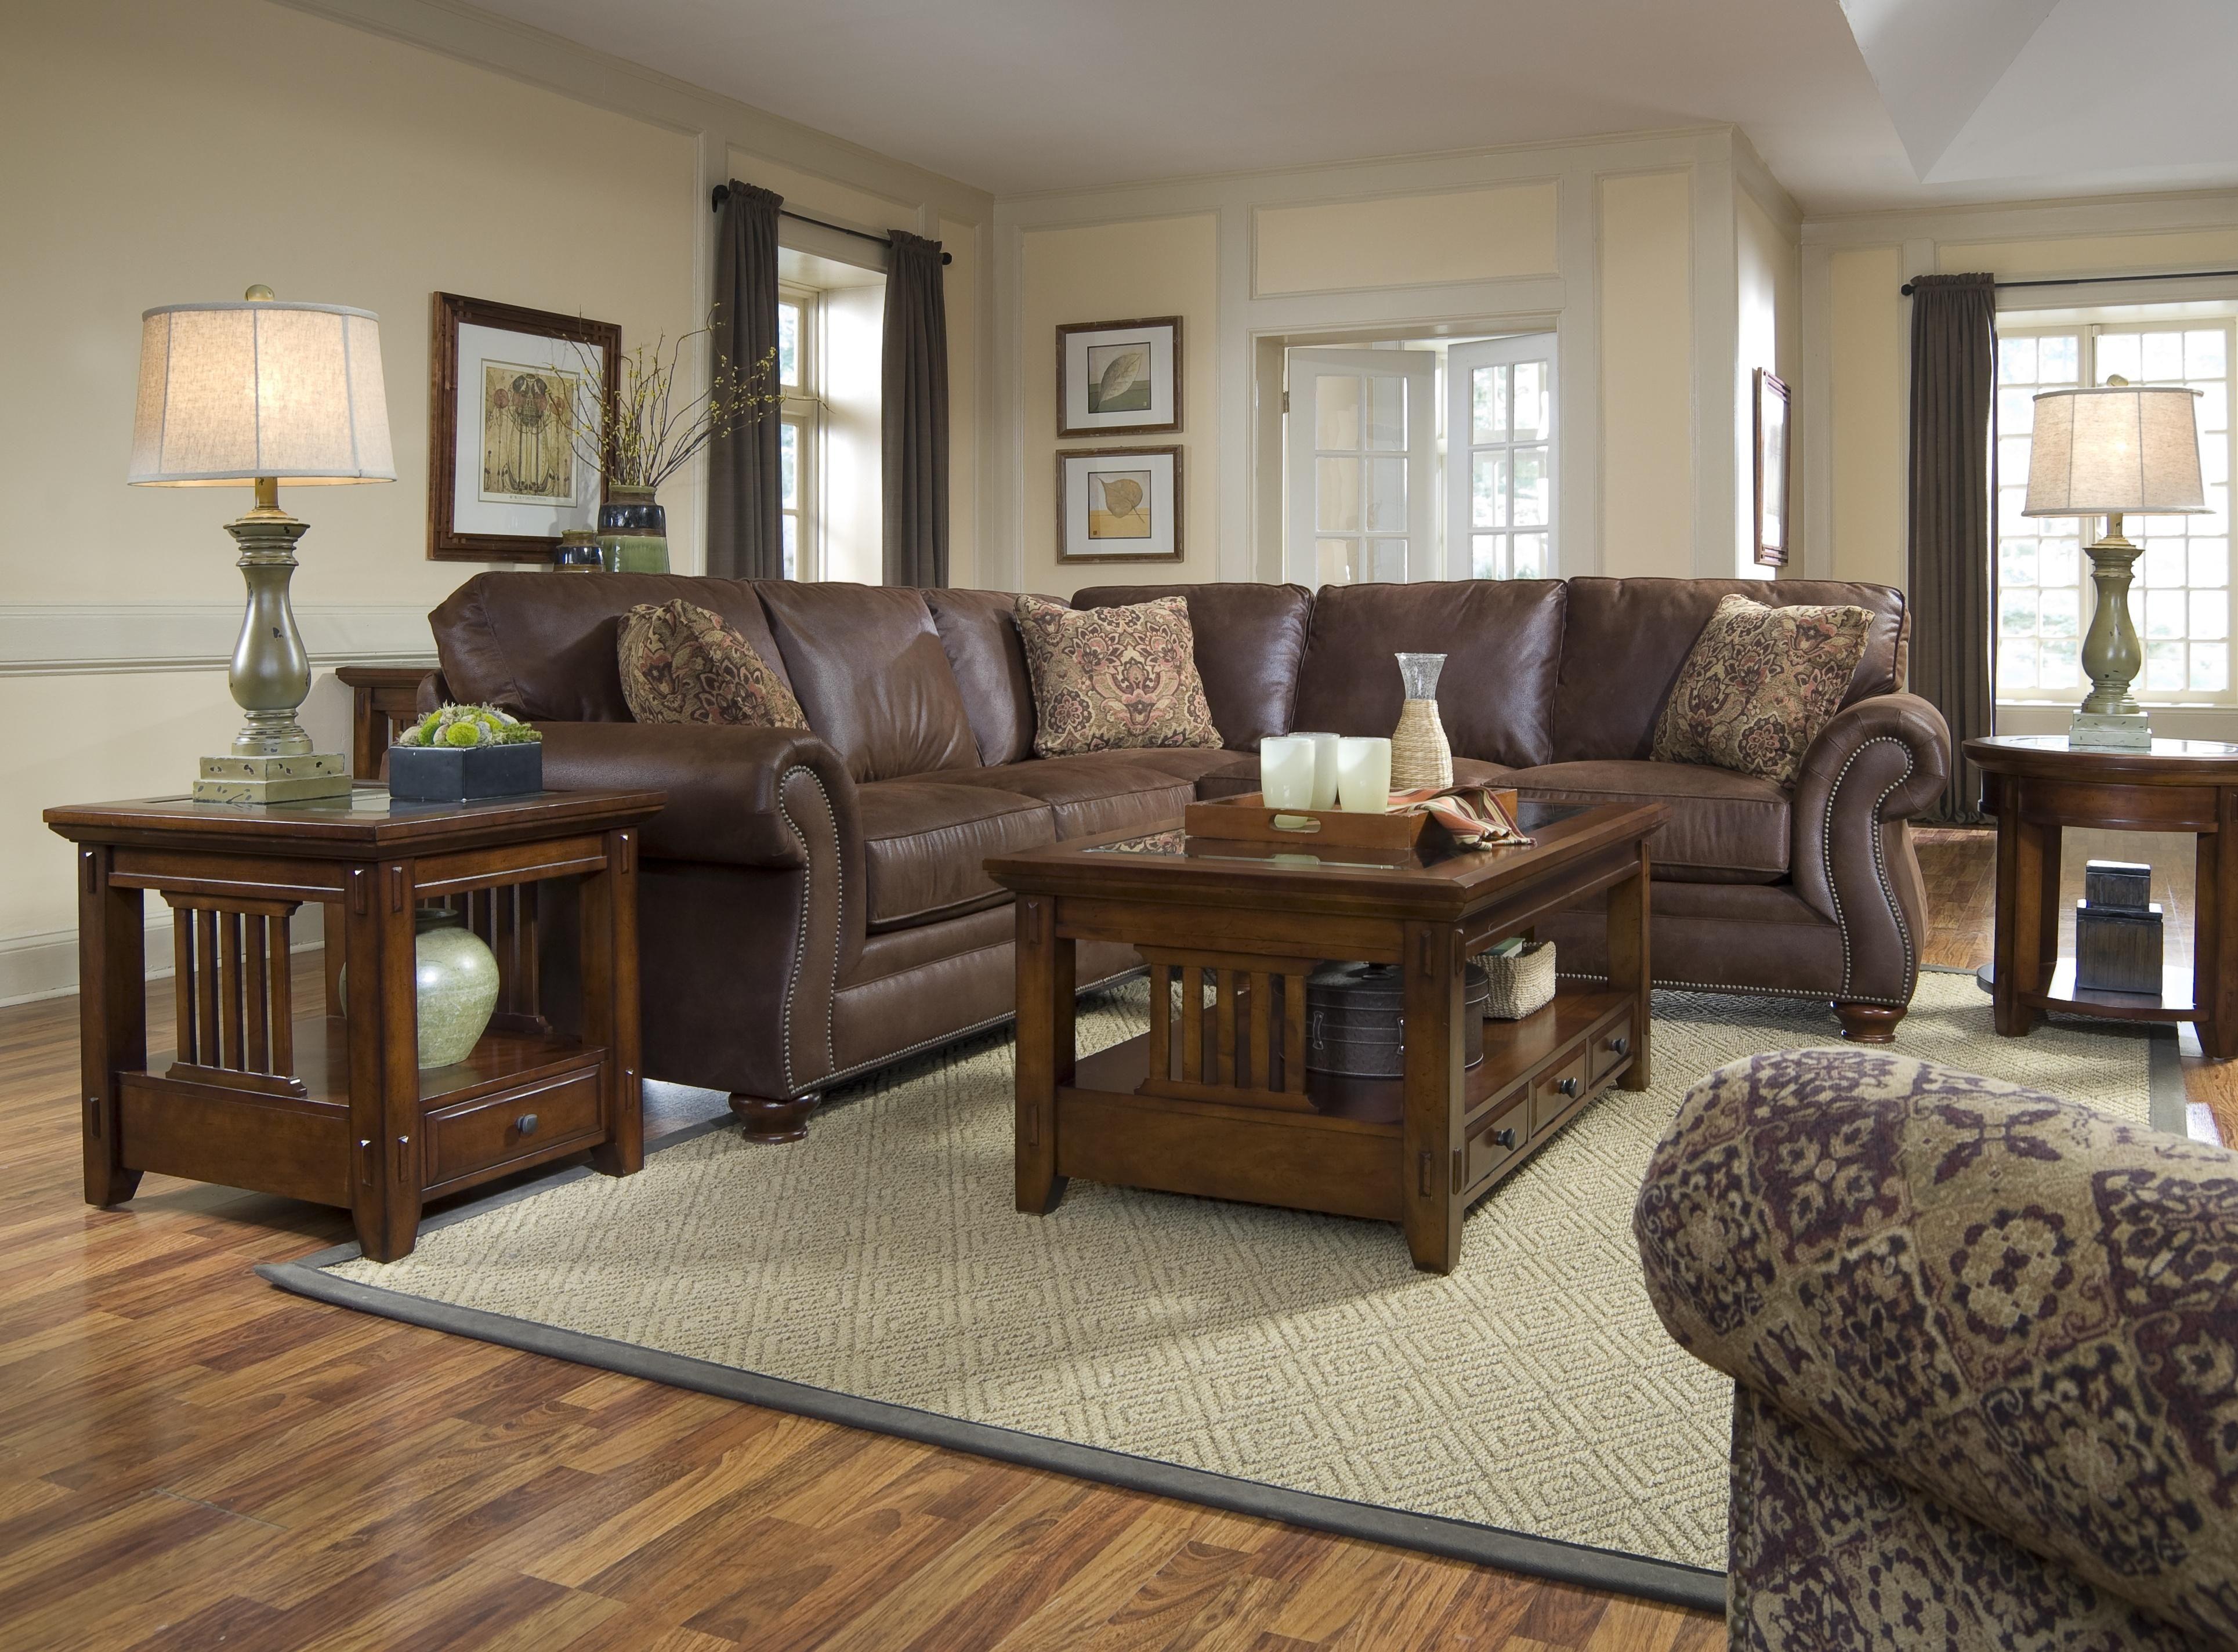 Broyhill Furniture Laramie Collection Corner Sectional Sofa Livingroom